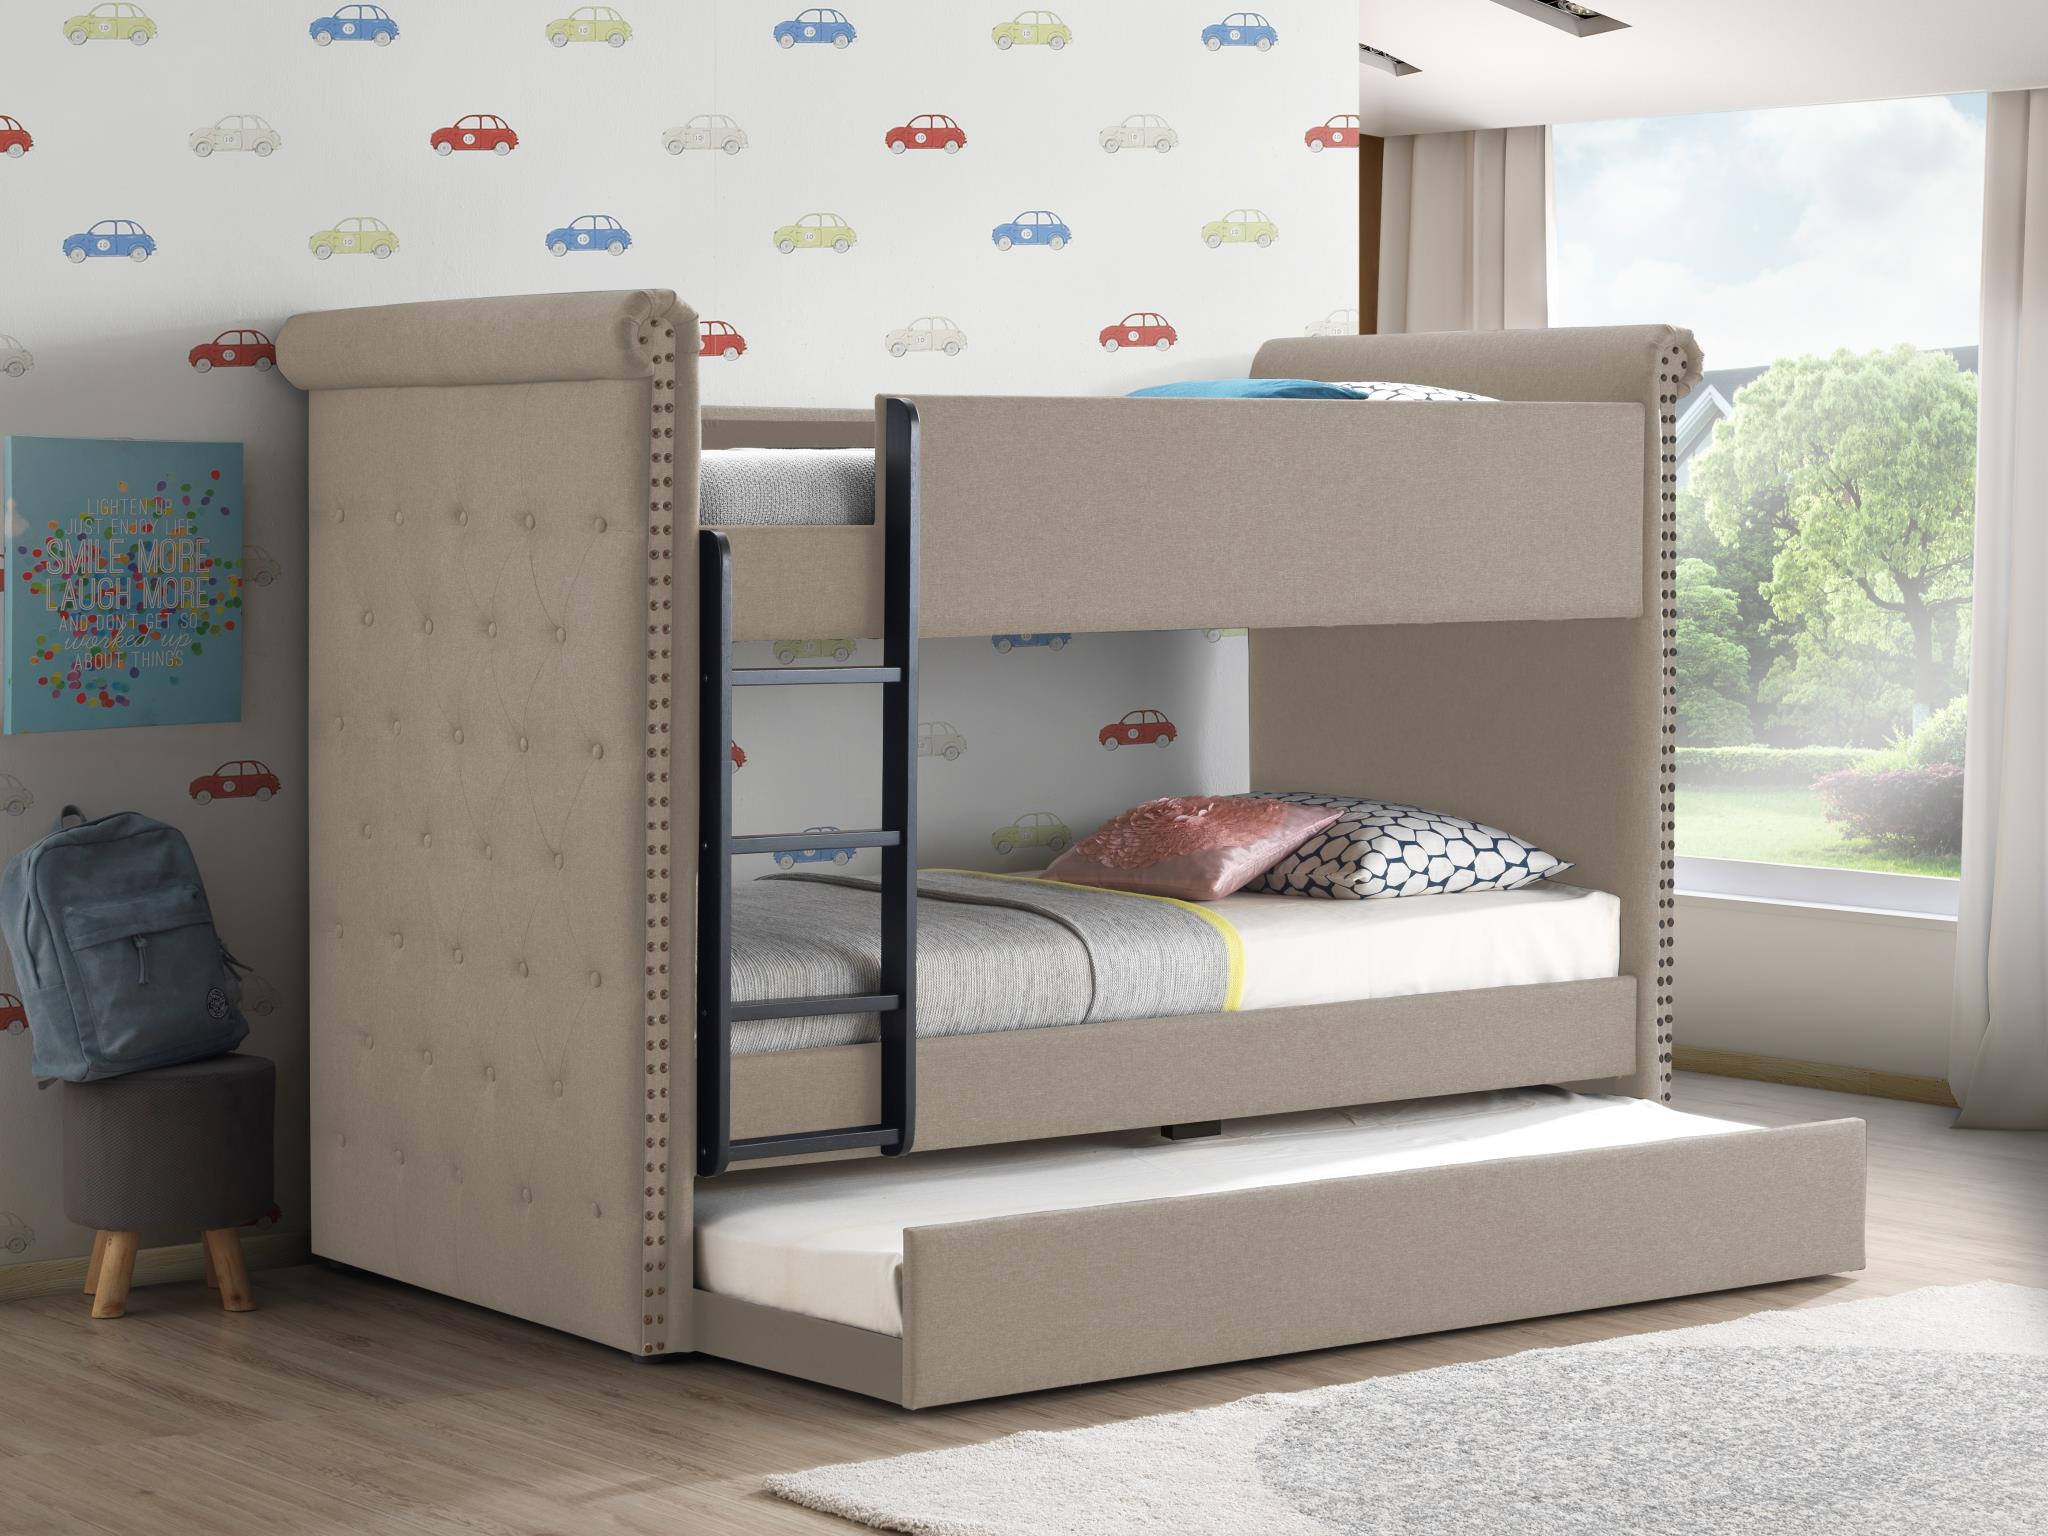 Romana Bunk Bed